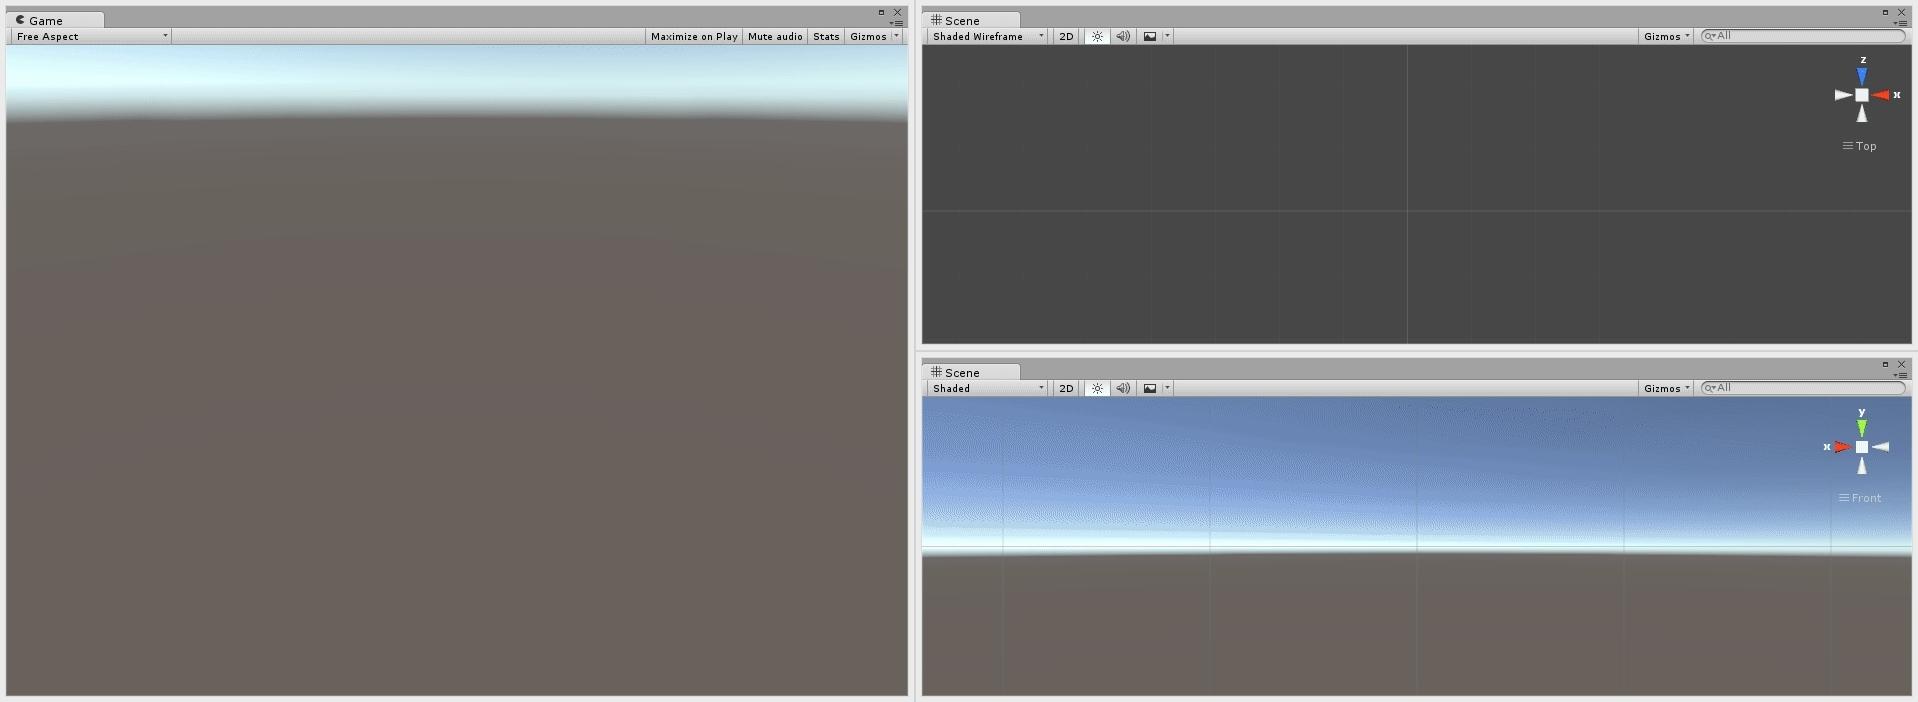 leveldesign, proceduralgeneration, unity3d, Procedural Level Generation in Unity3D part 3 GIFs